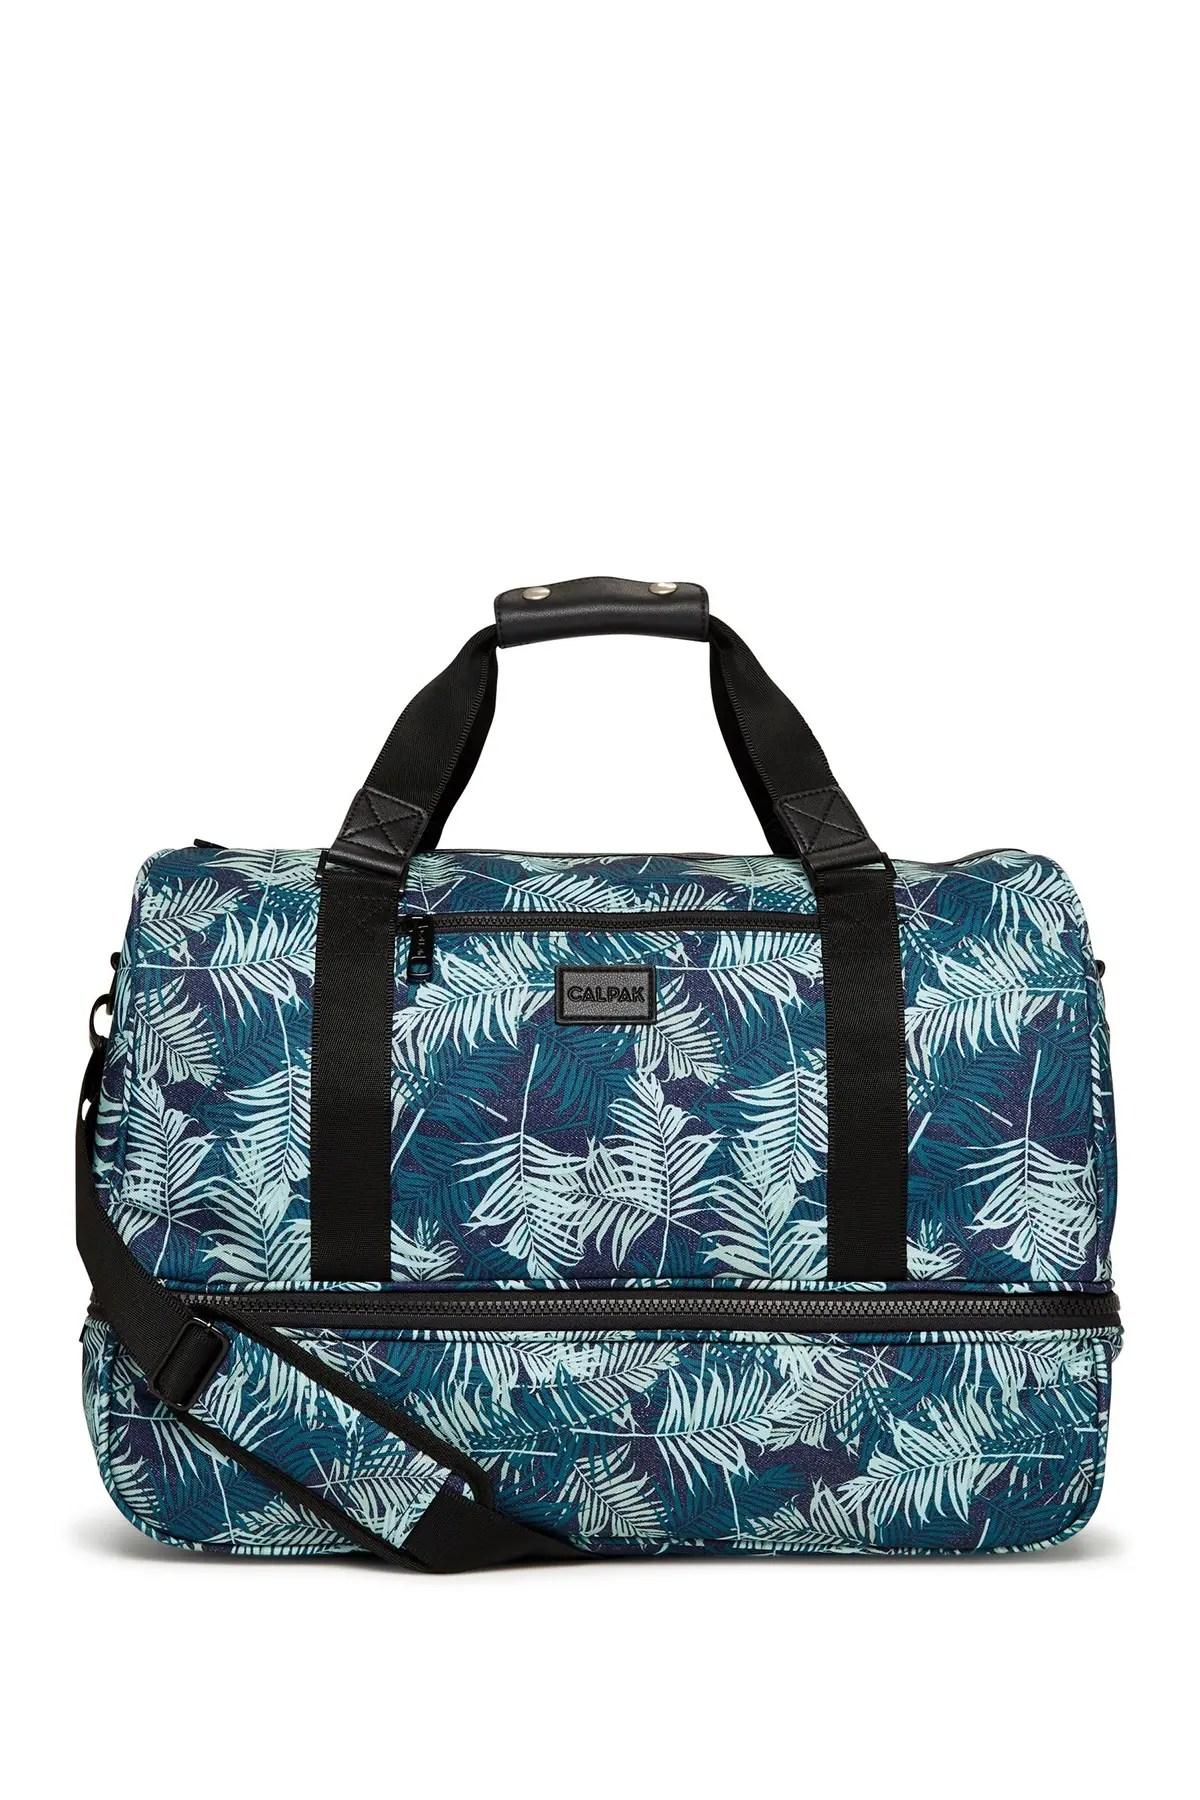 calpak luggage stevyn drop bottom duffel bag nordstrom rack